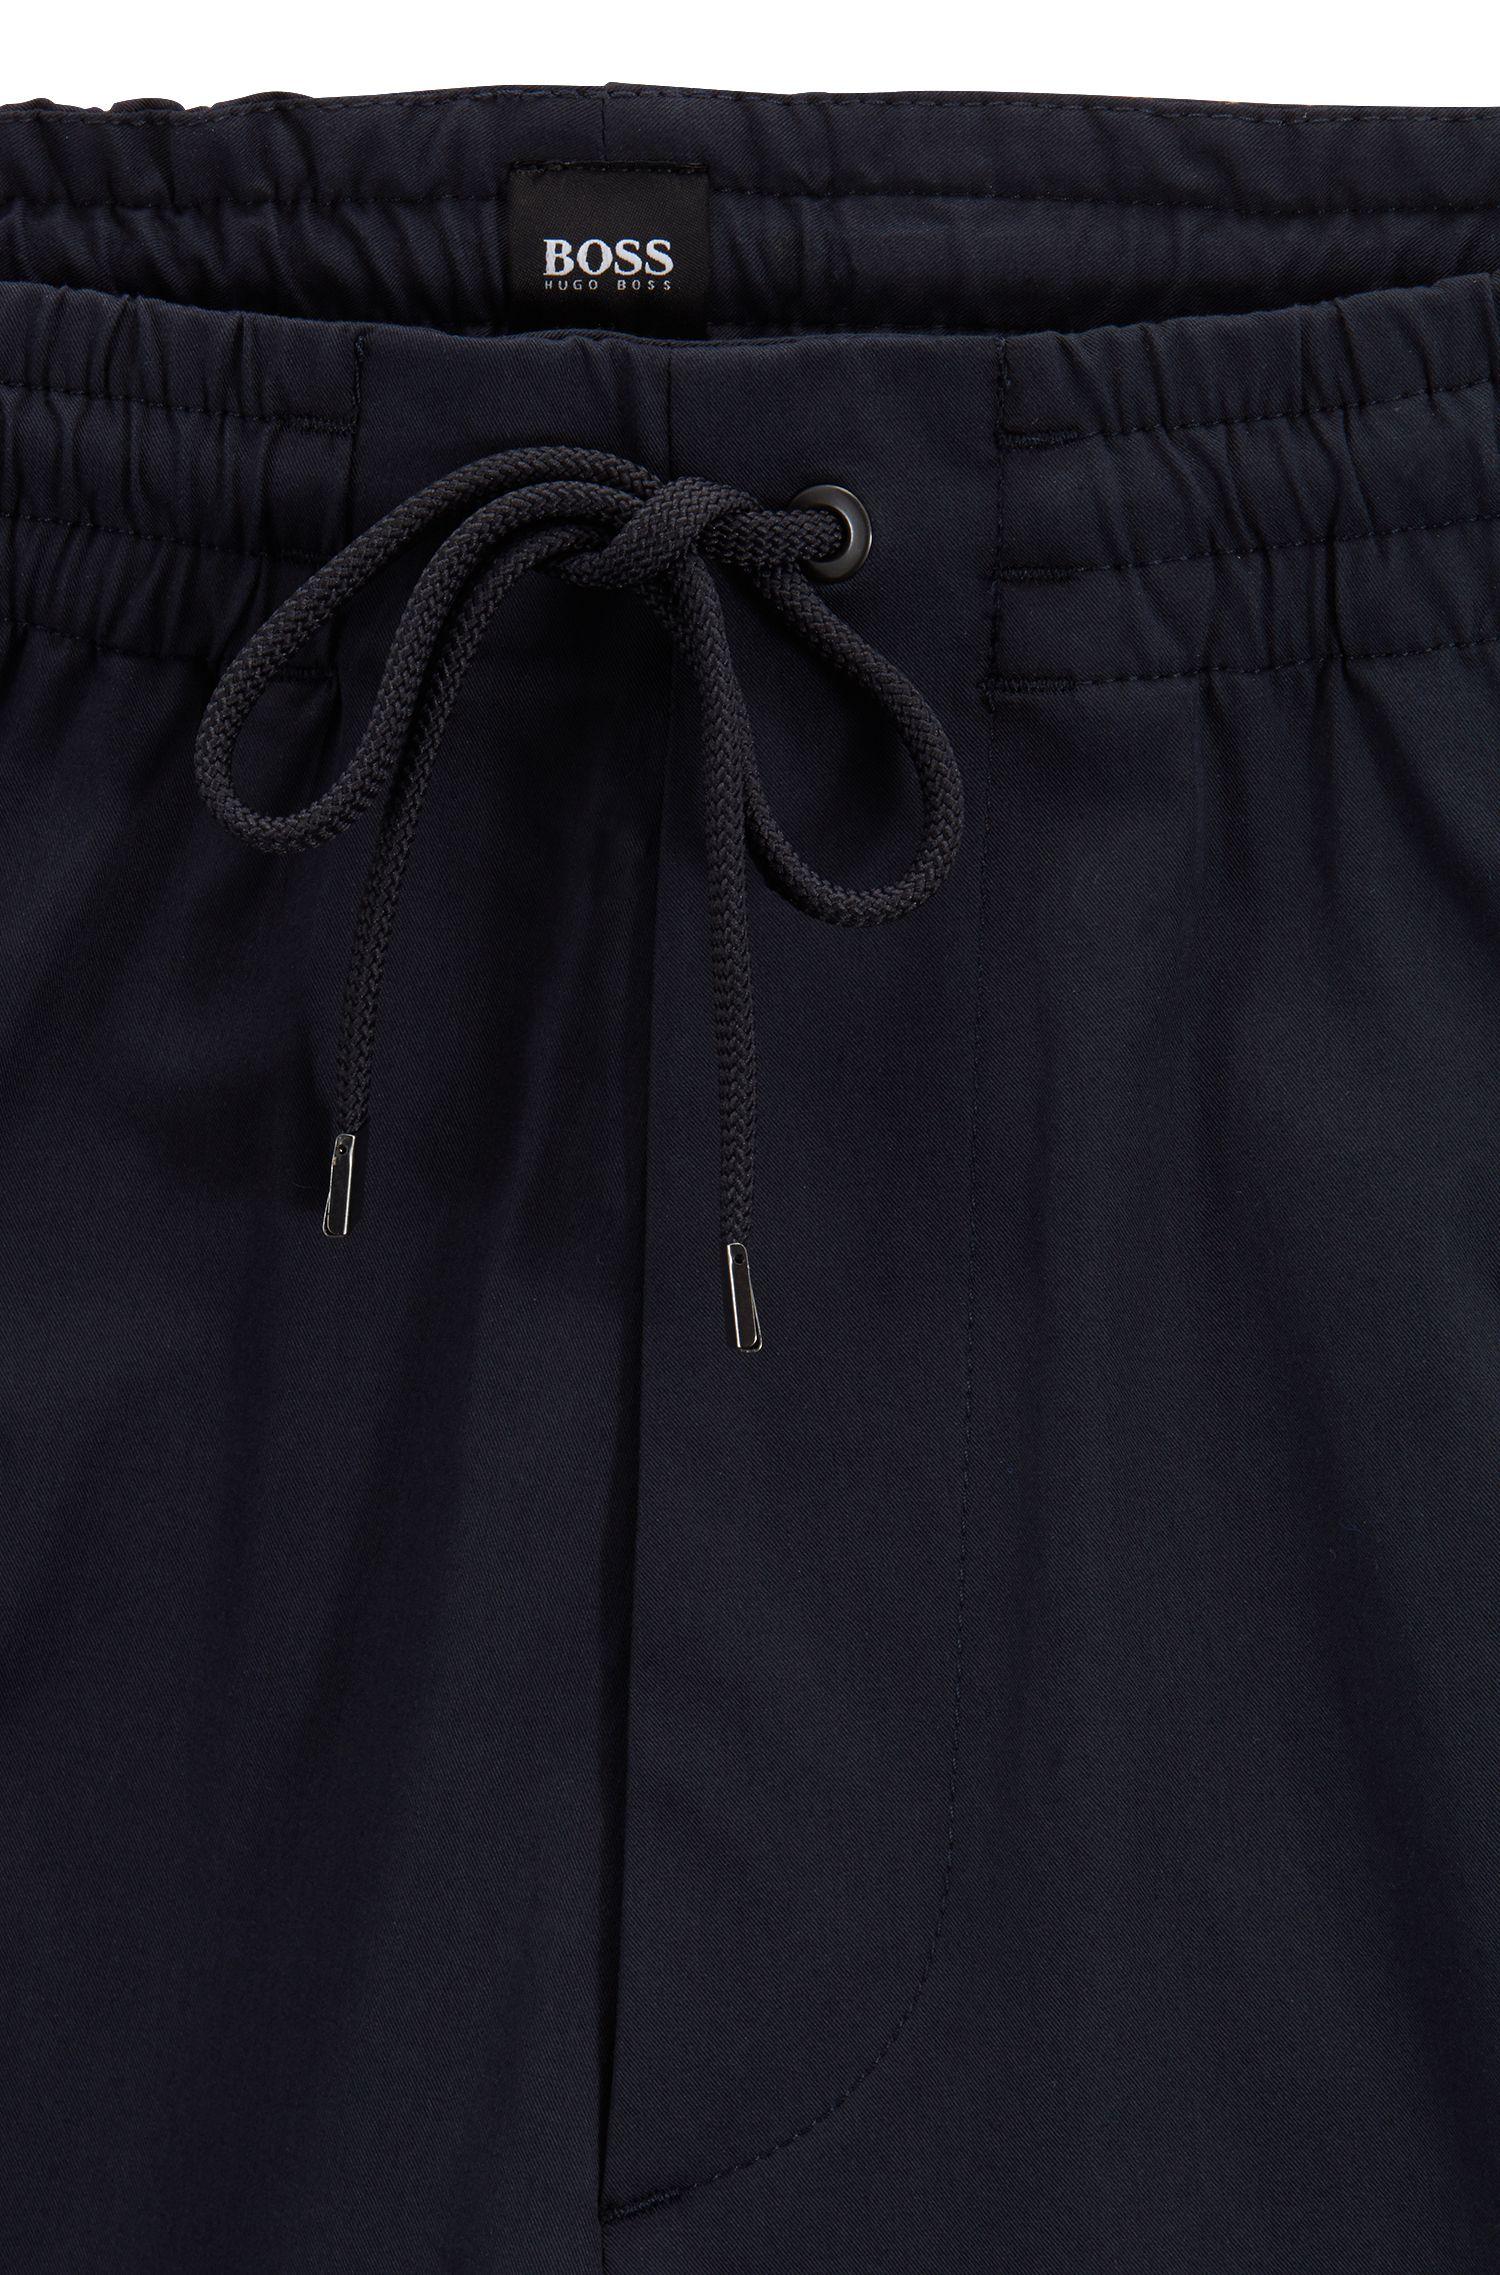 Chinos relaxed fit en algodón elástico ligero italiano, Azul oscuro